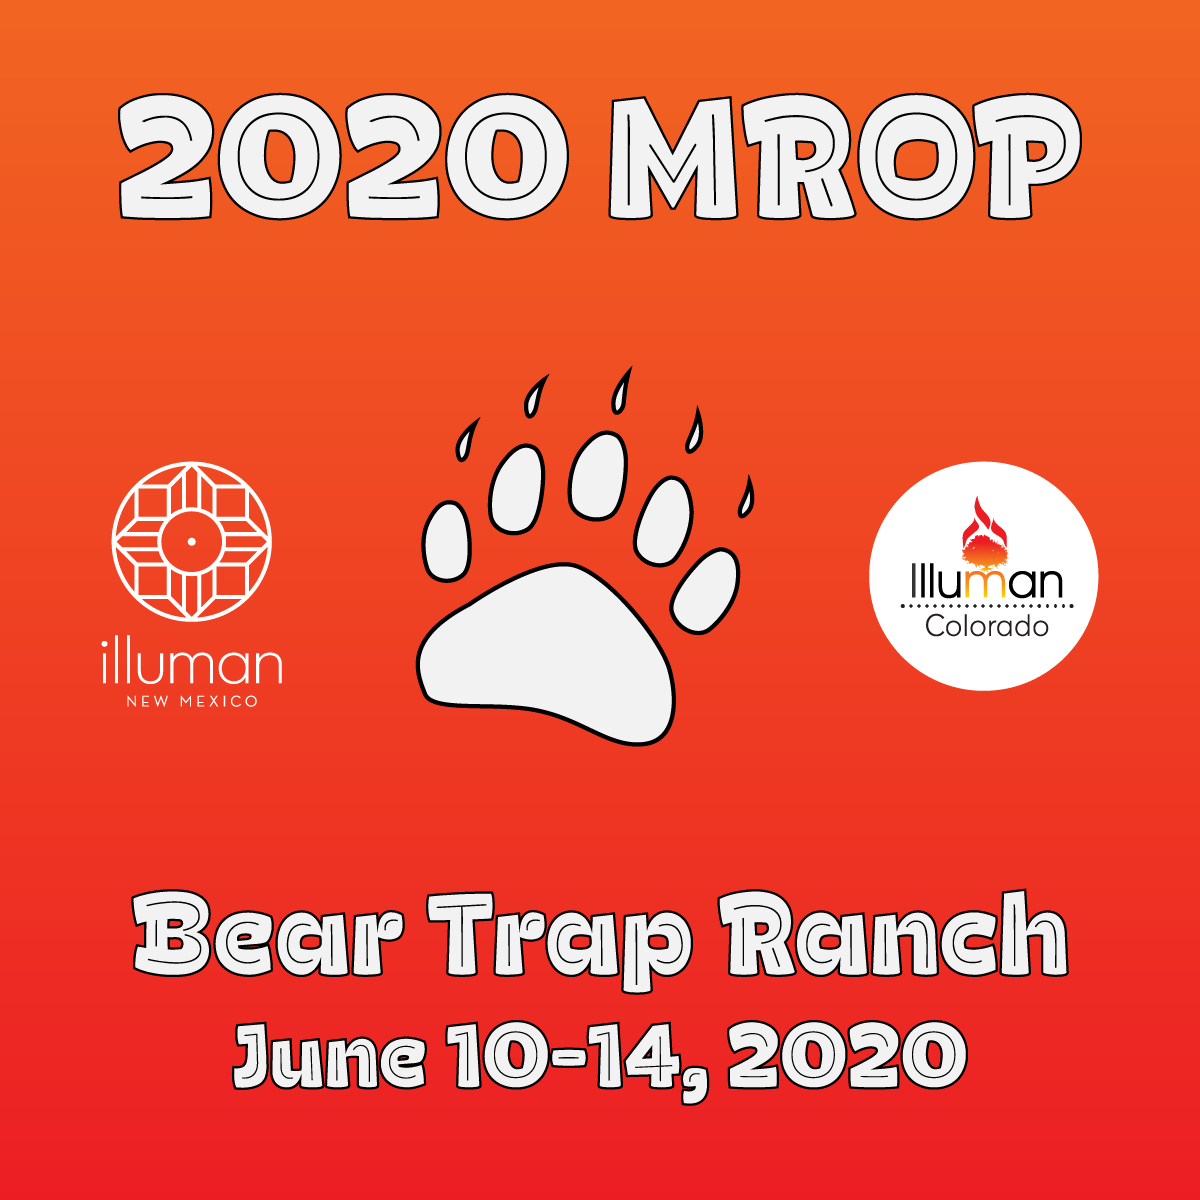 2020 MROP Application